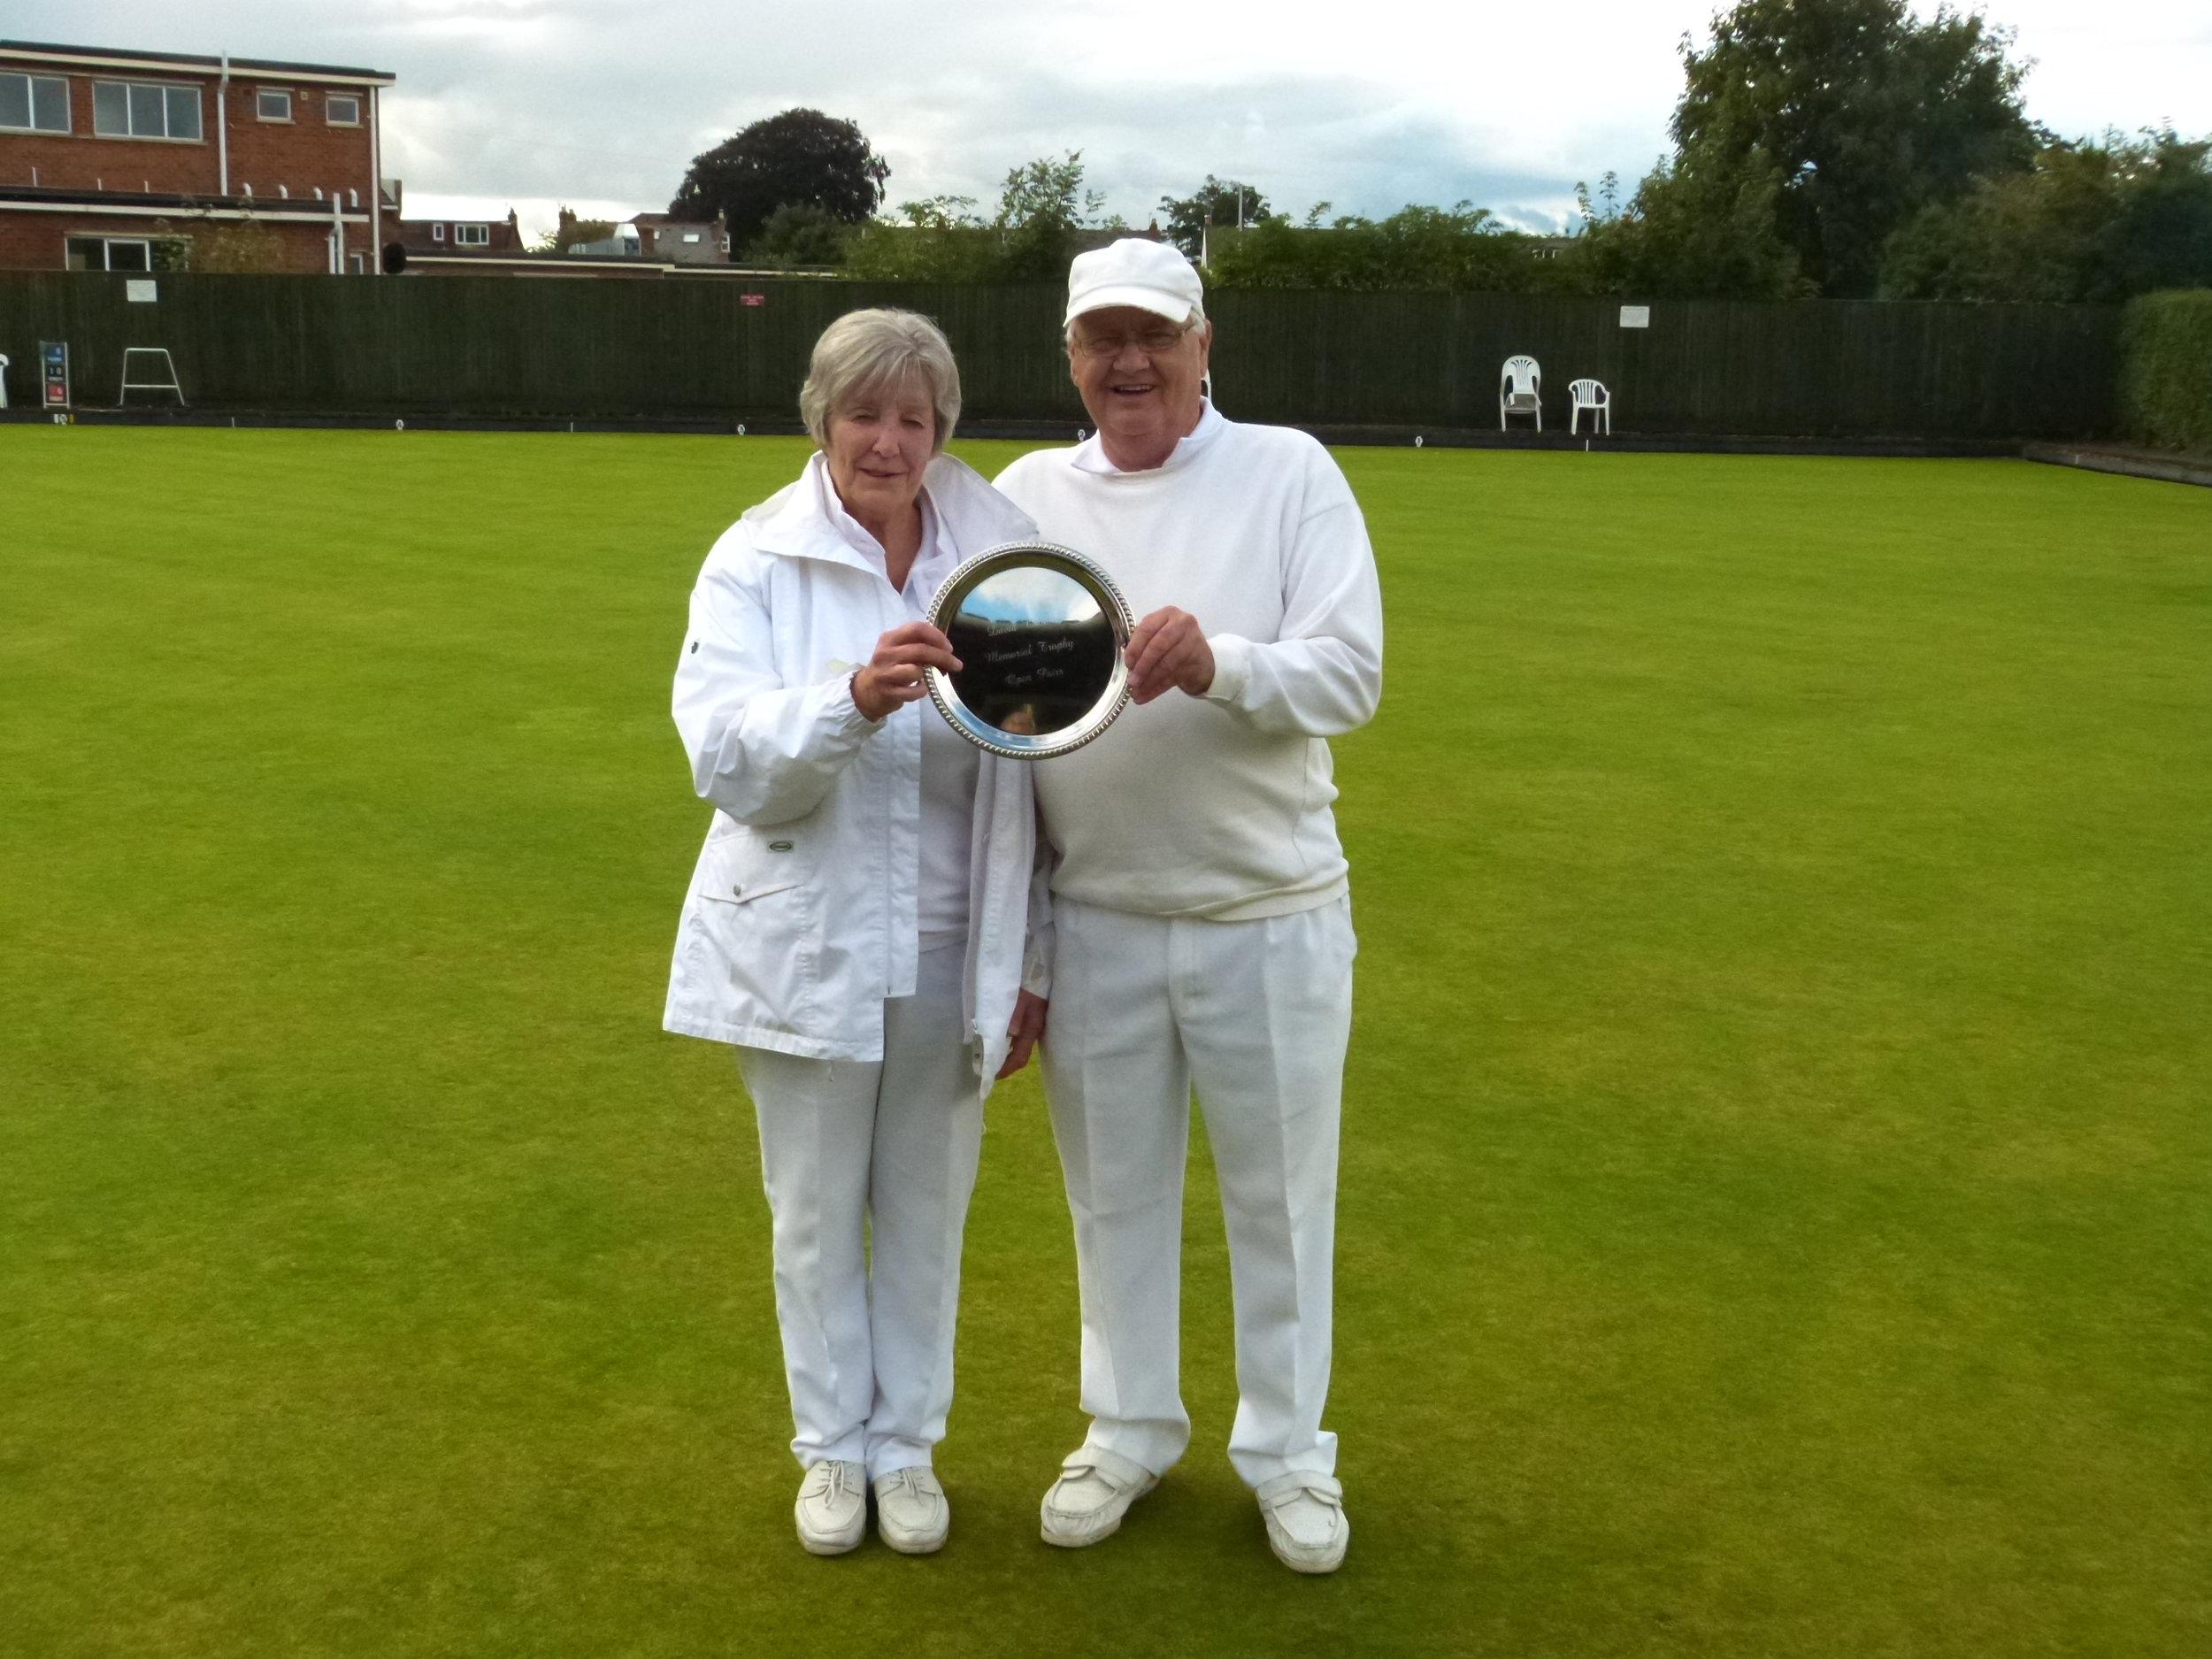 DAVID THOMAS PLATE   Winners - Valerie Smith & Colin Bruton  Runners Up - Roy Limbrick & Hazel Hembling